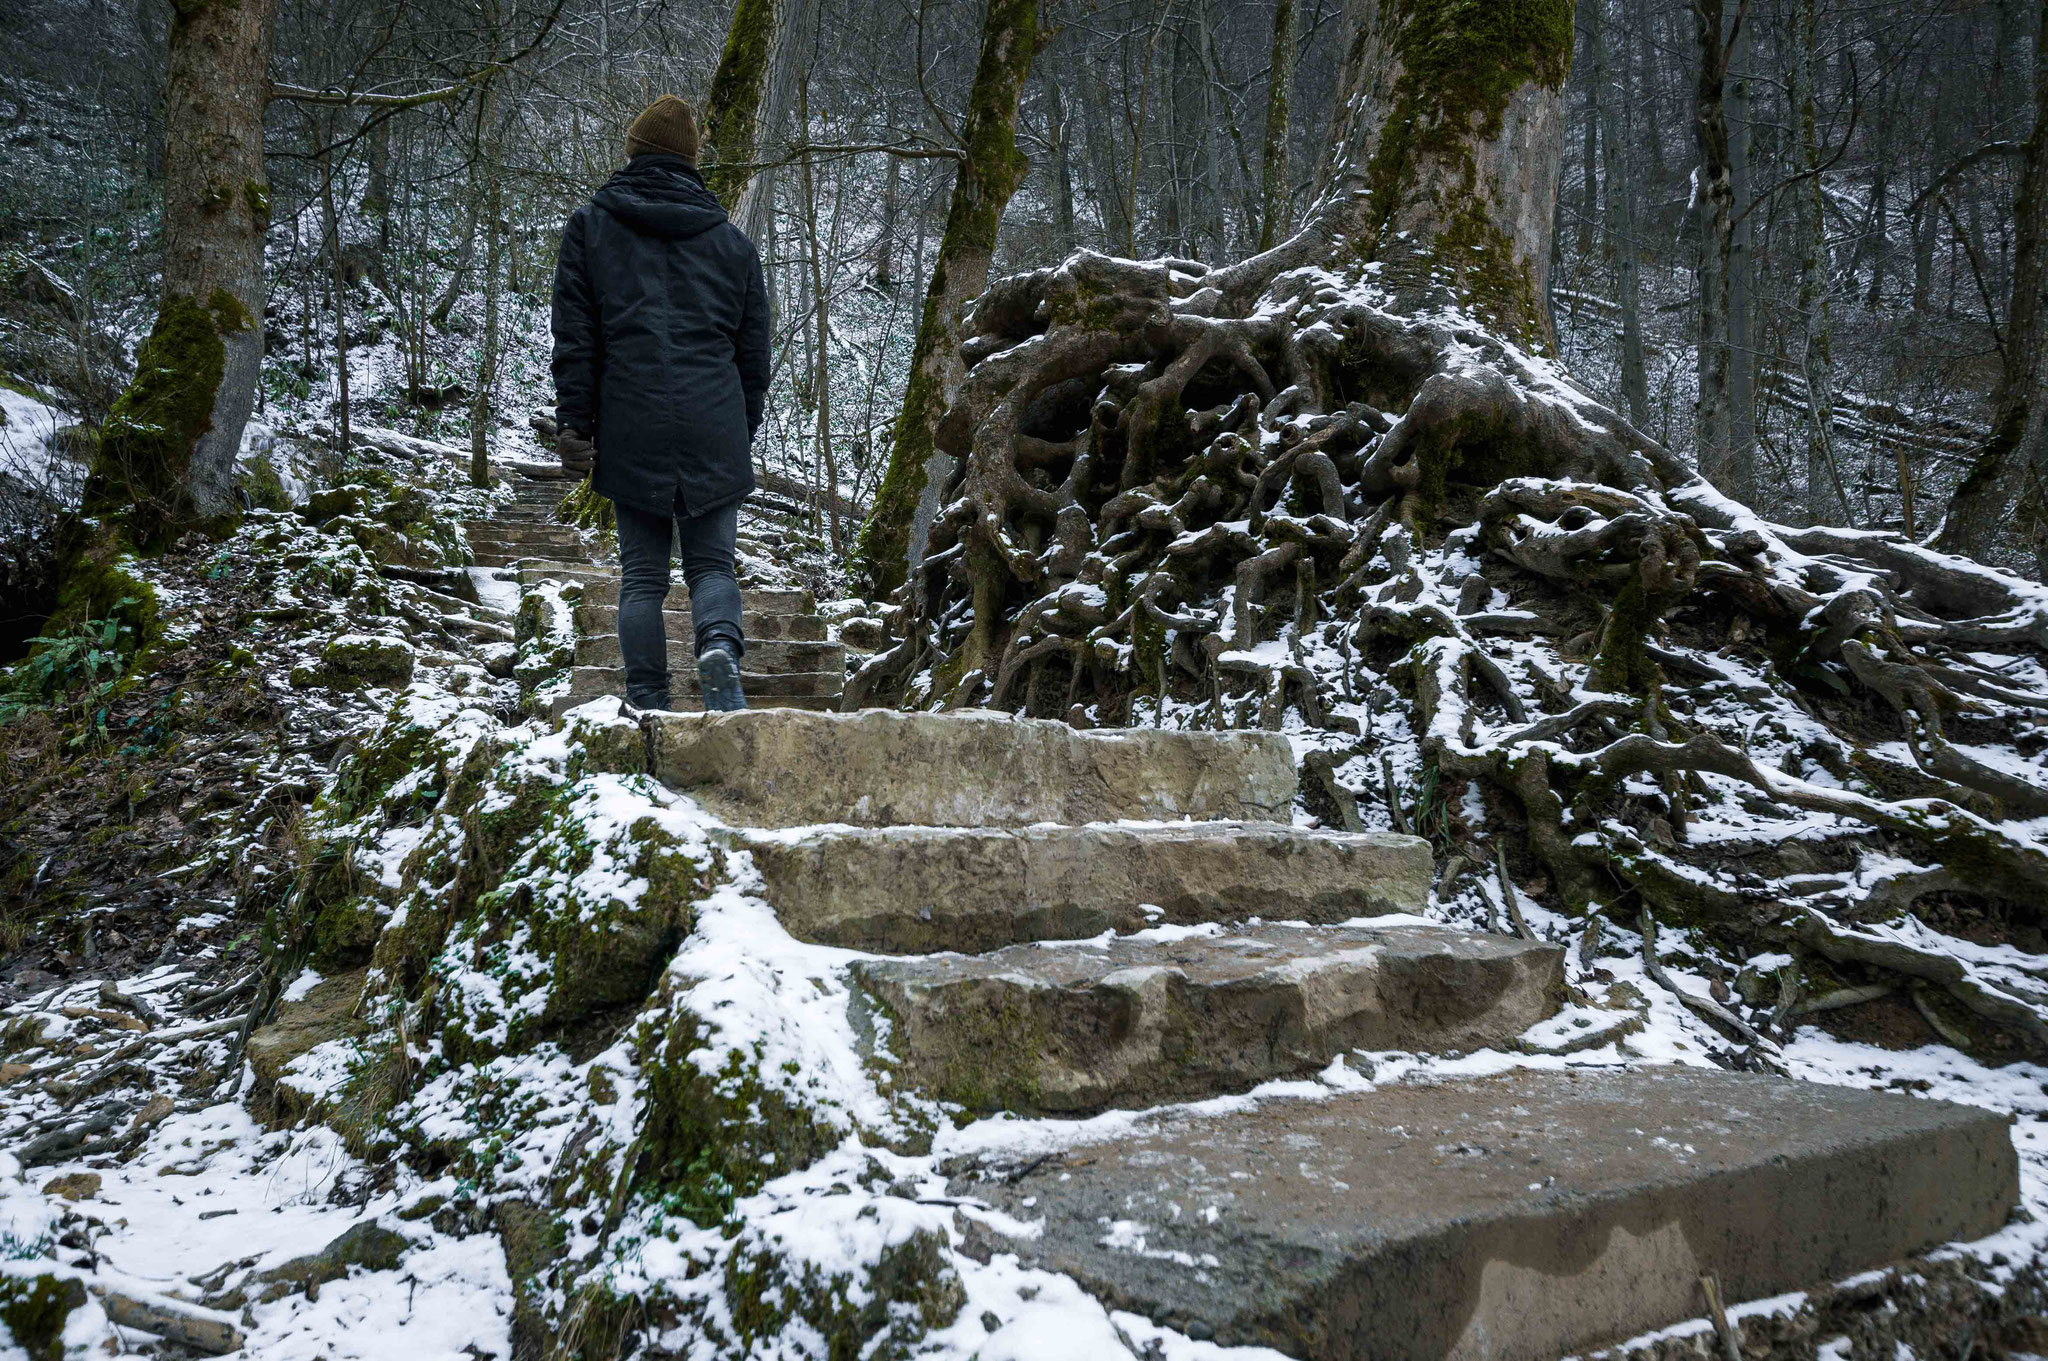 Wandern im Wald; Wasserfall Bad Urach